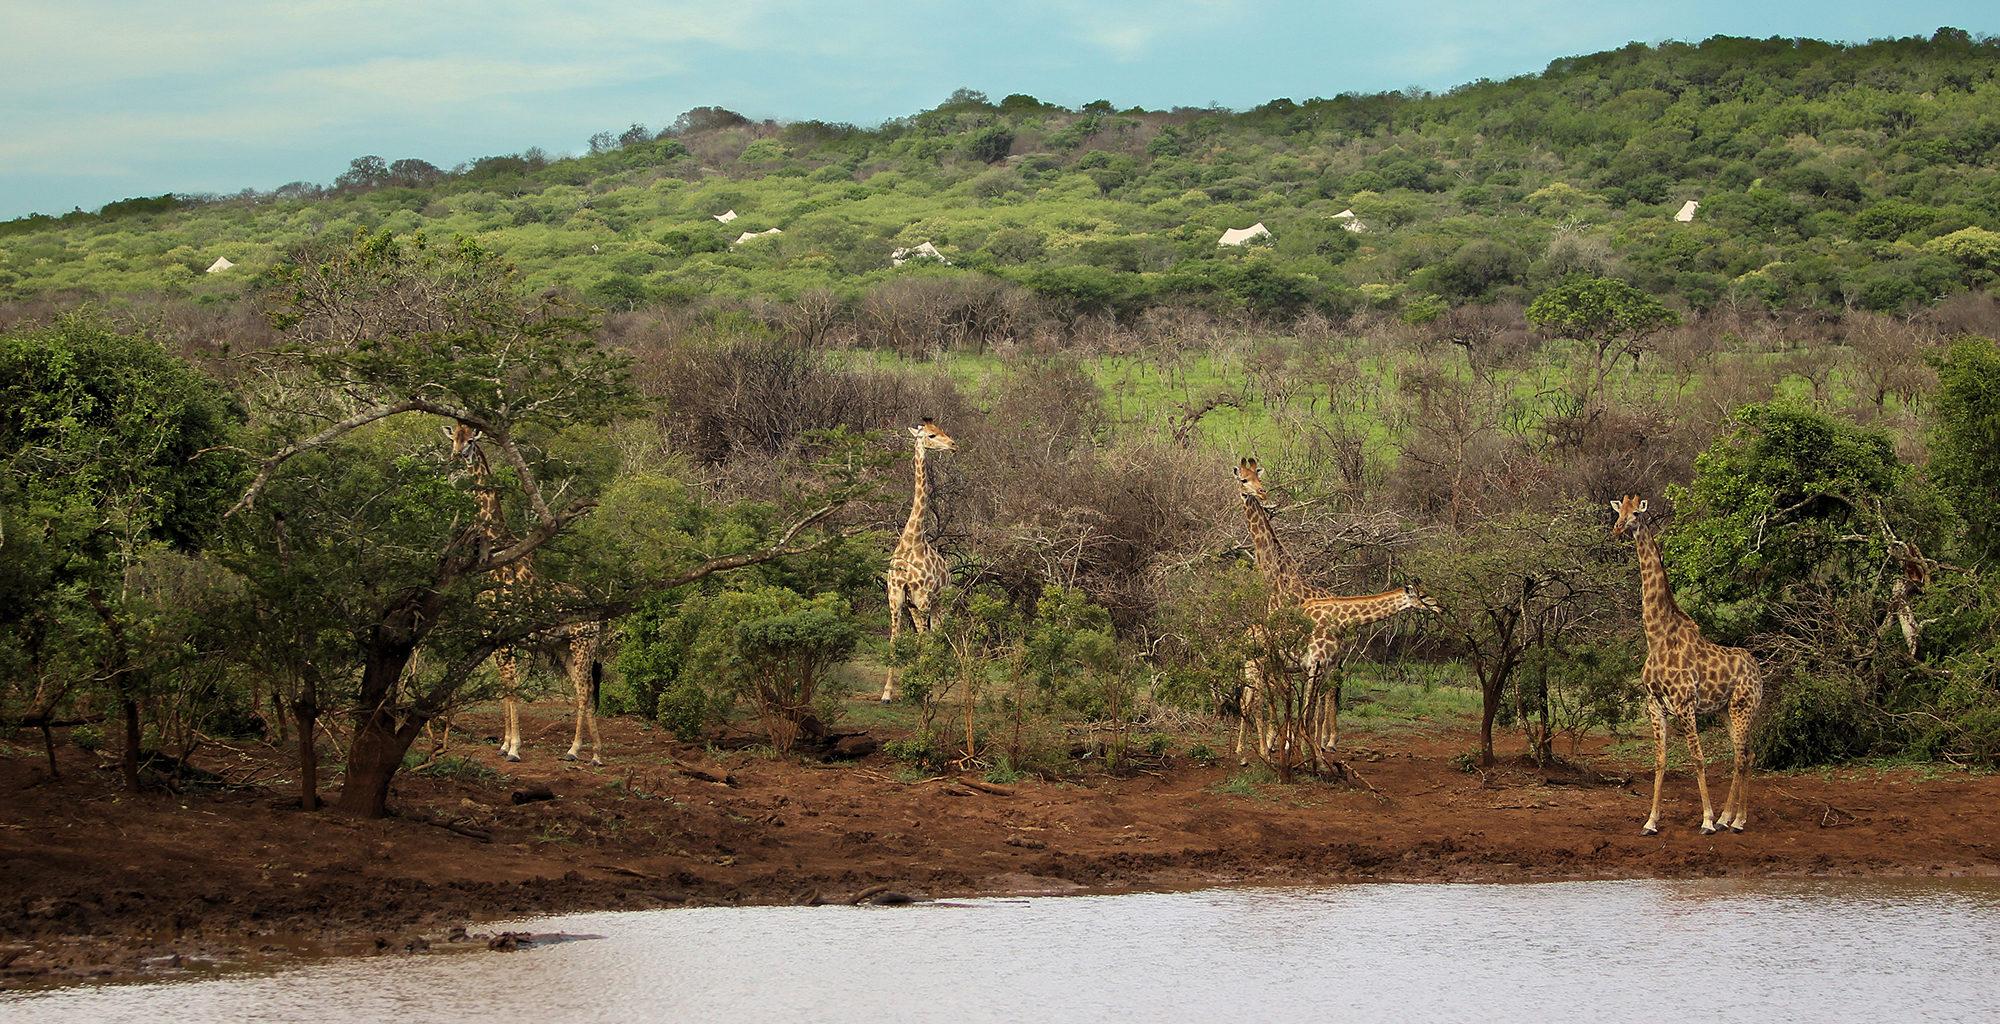 South-Africa-KwaZulu-Natal-Giraffe